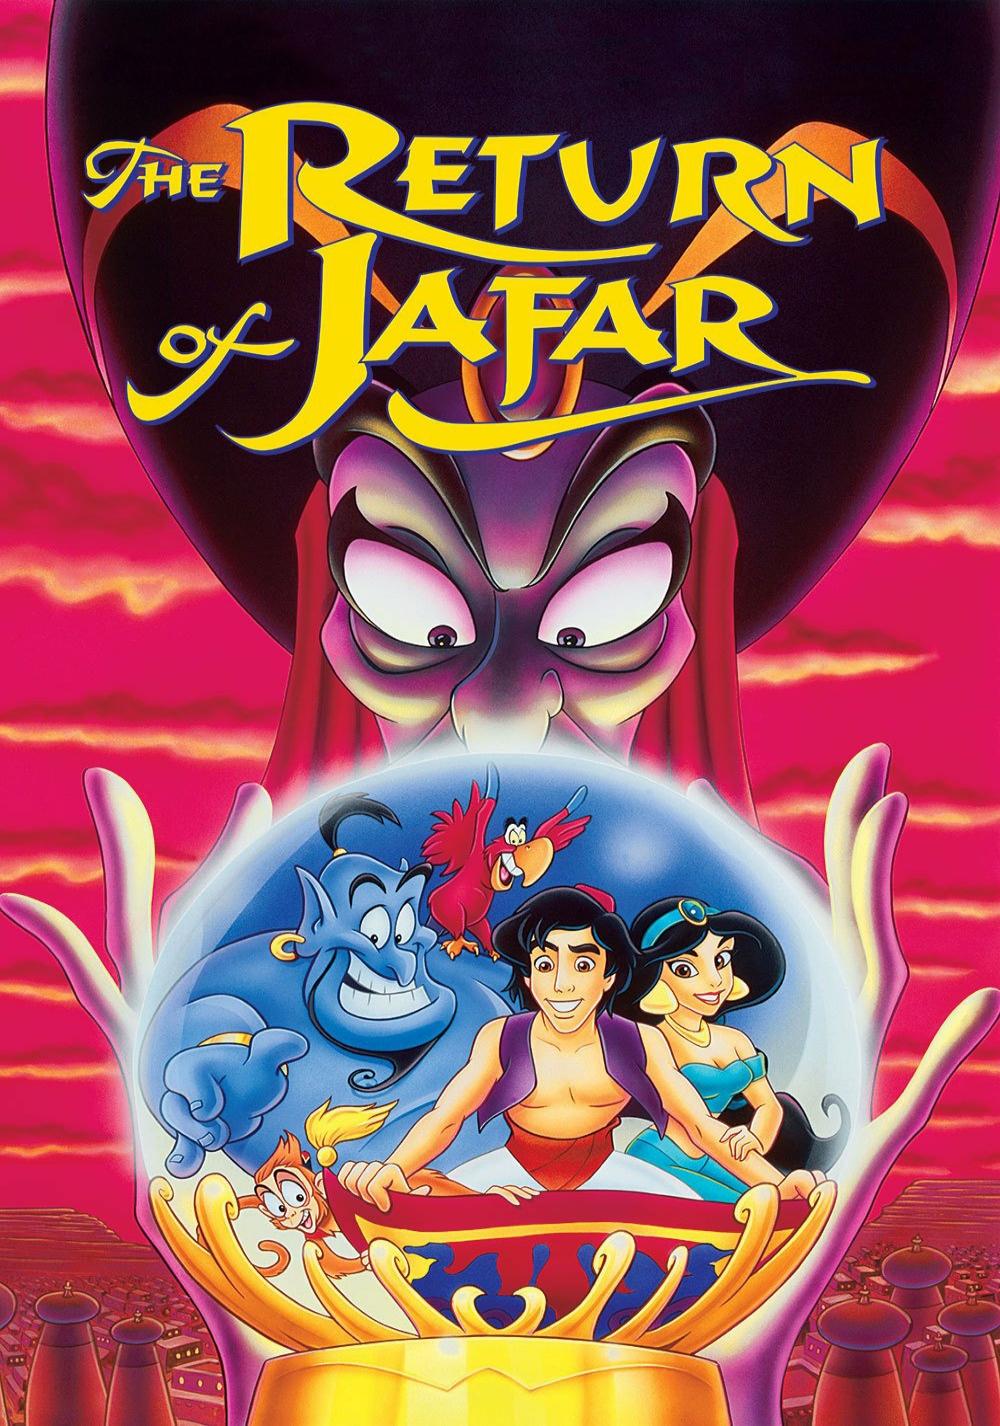 Aladdin: The Return of Jafar (1994; animated)